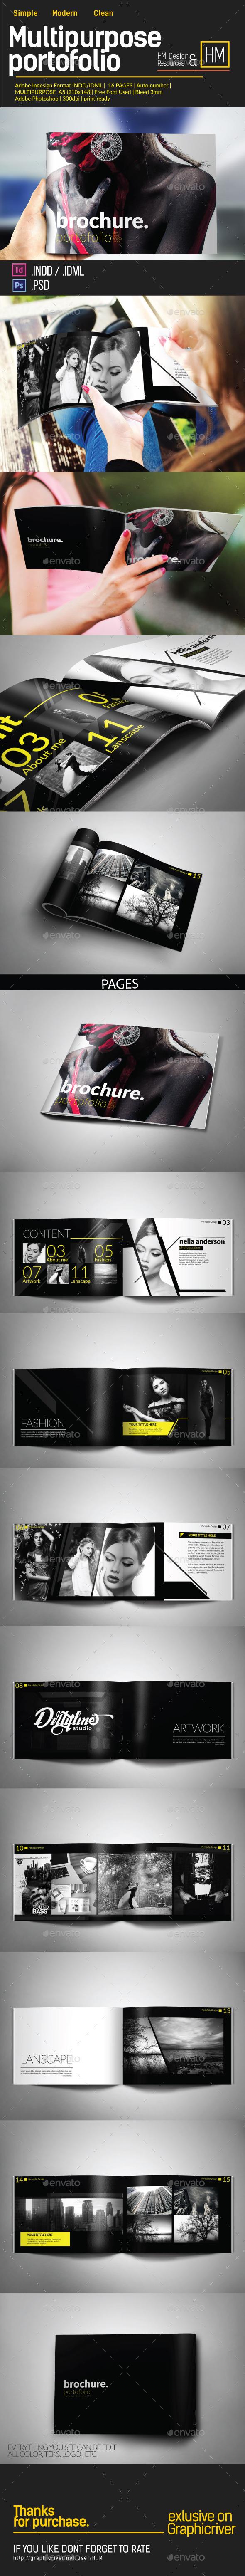 MODERN BROCHURE CATALOG OR PORTOFOLIO DESIGN - Portfolio Brochures